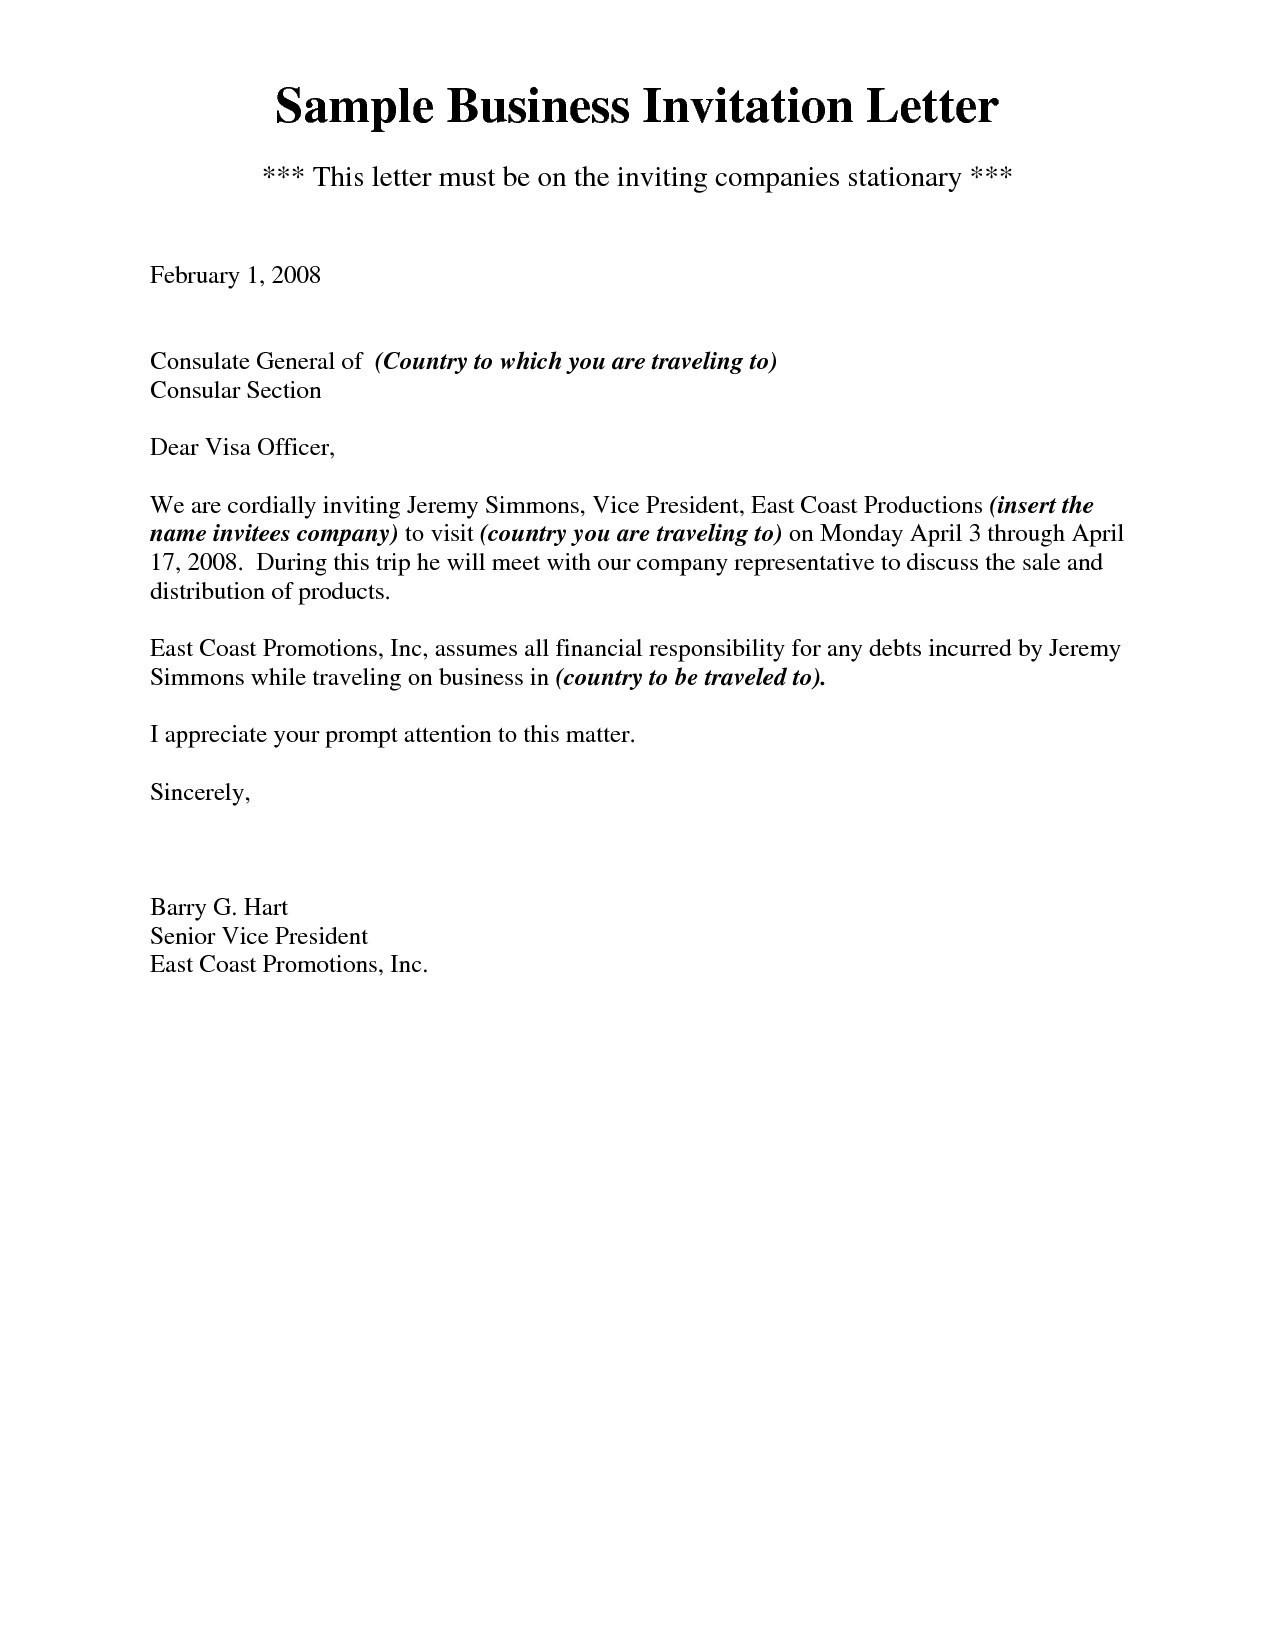 Business Invitation Letter Template - Invitation Letter format for Schengen Business Visa Fresh Business